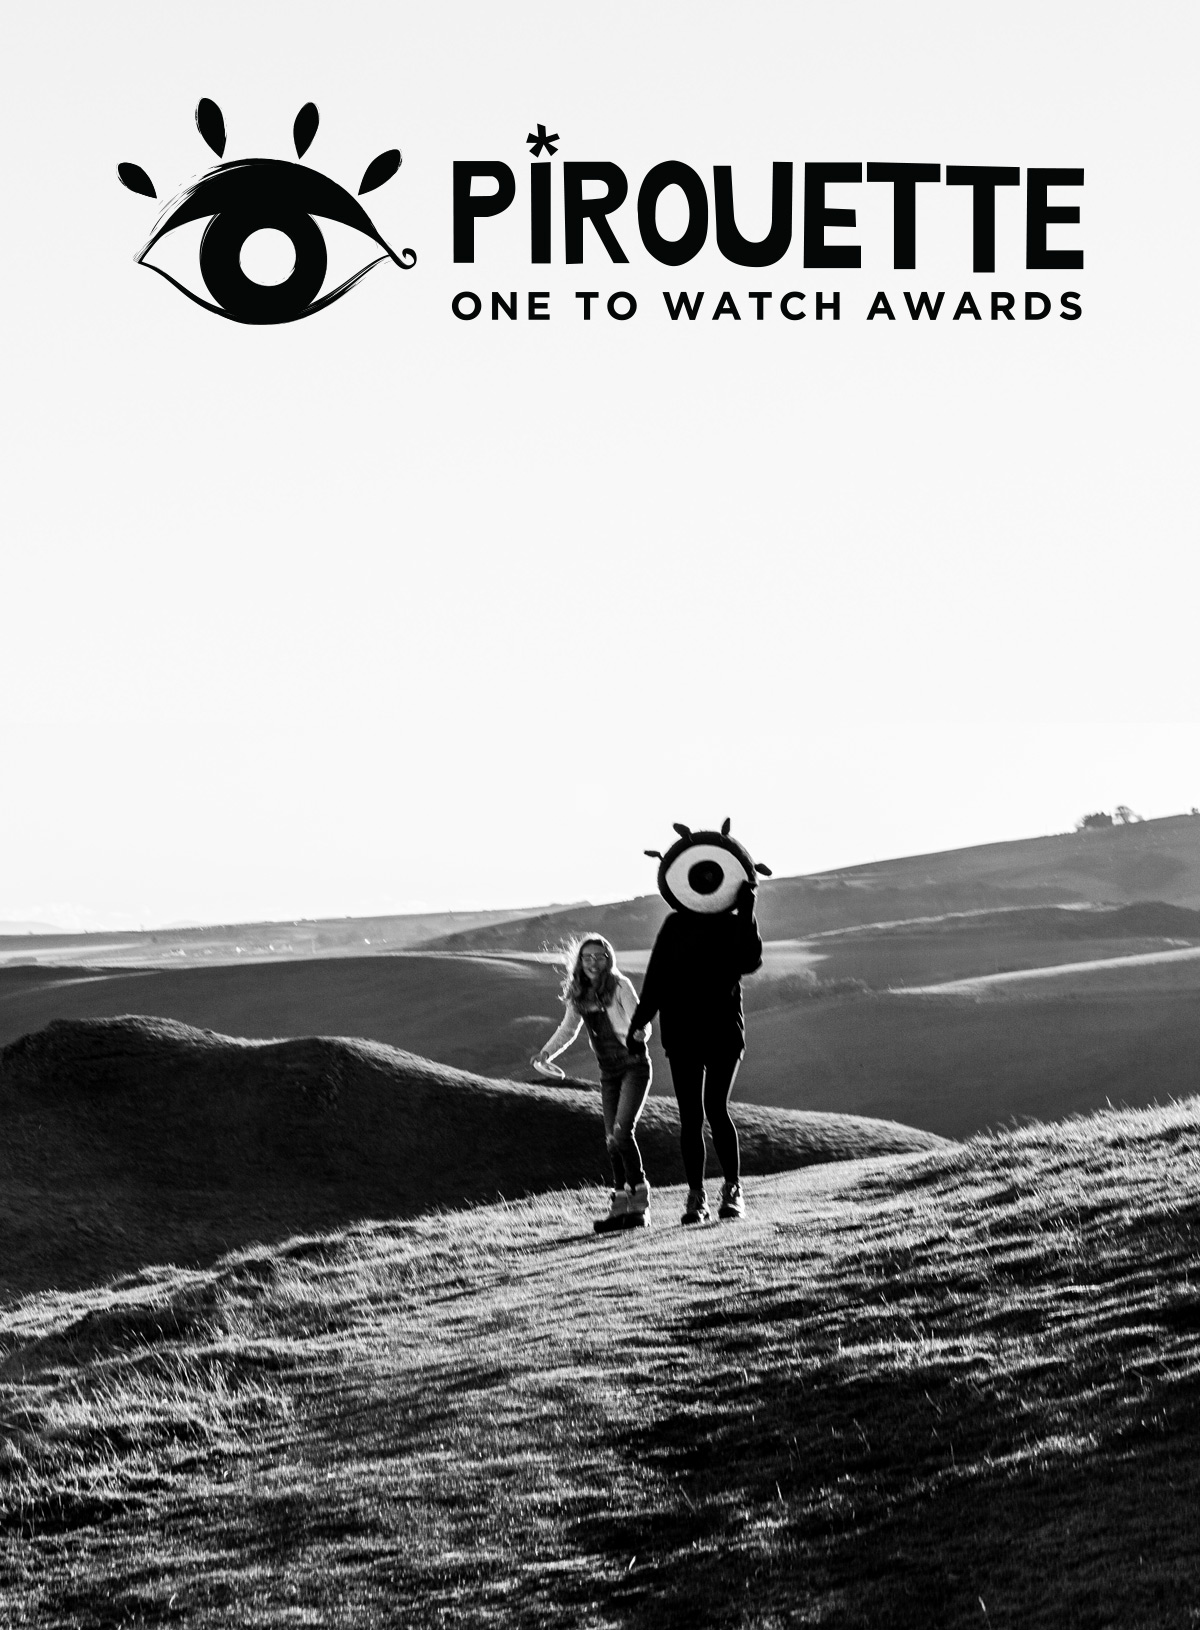 pirouette12watch-poster-b.jpg